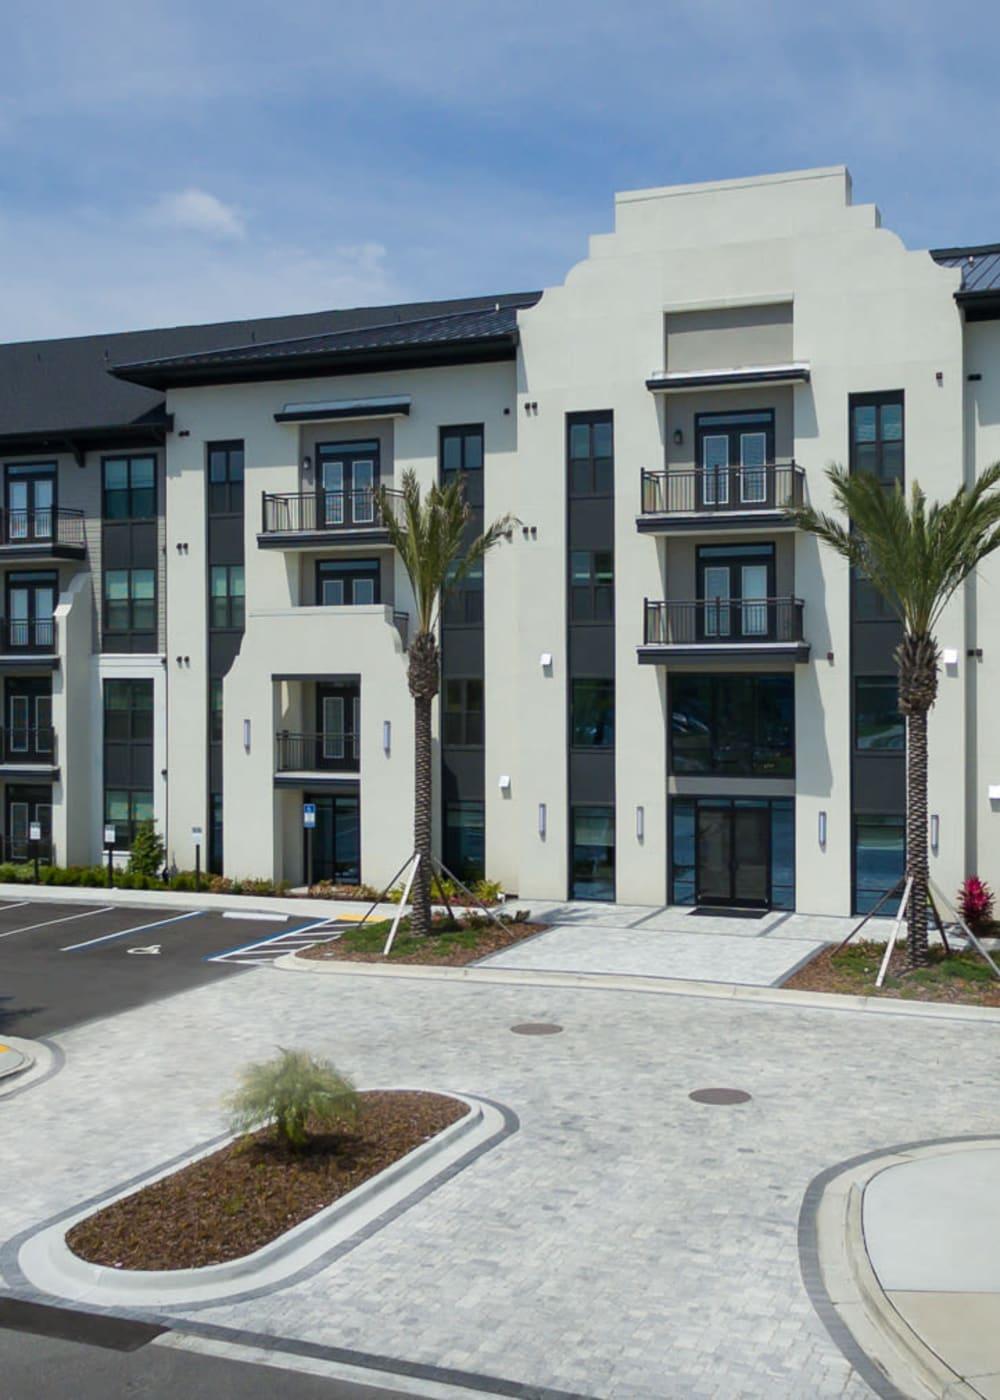 Town Center Jacksonville Fl Apartments For Rent The Jaxon